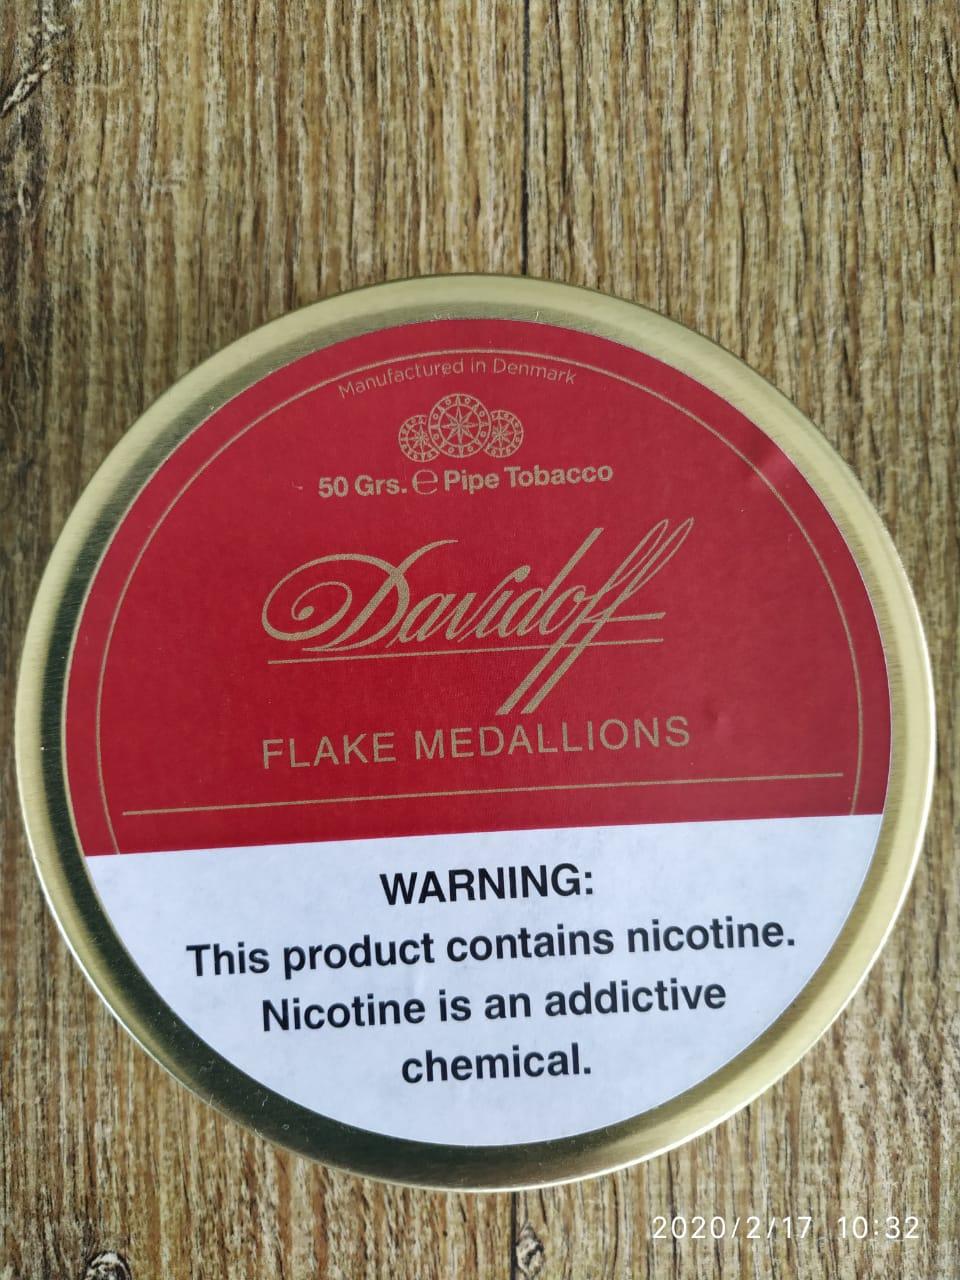 Davidoff - Flake Medallions